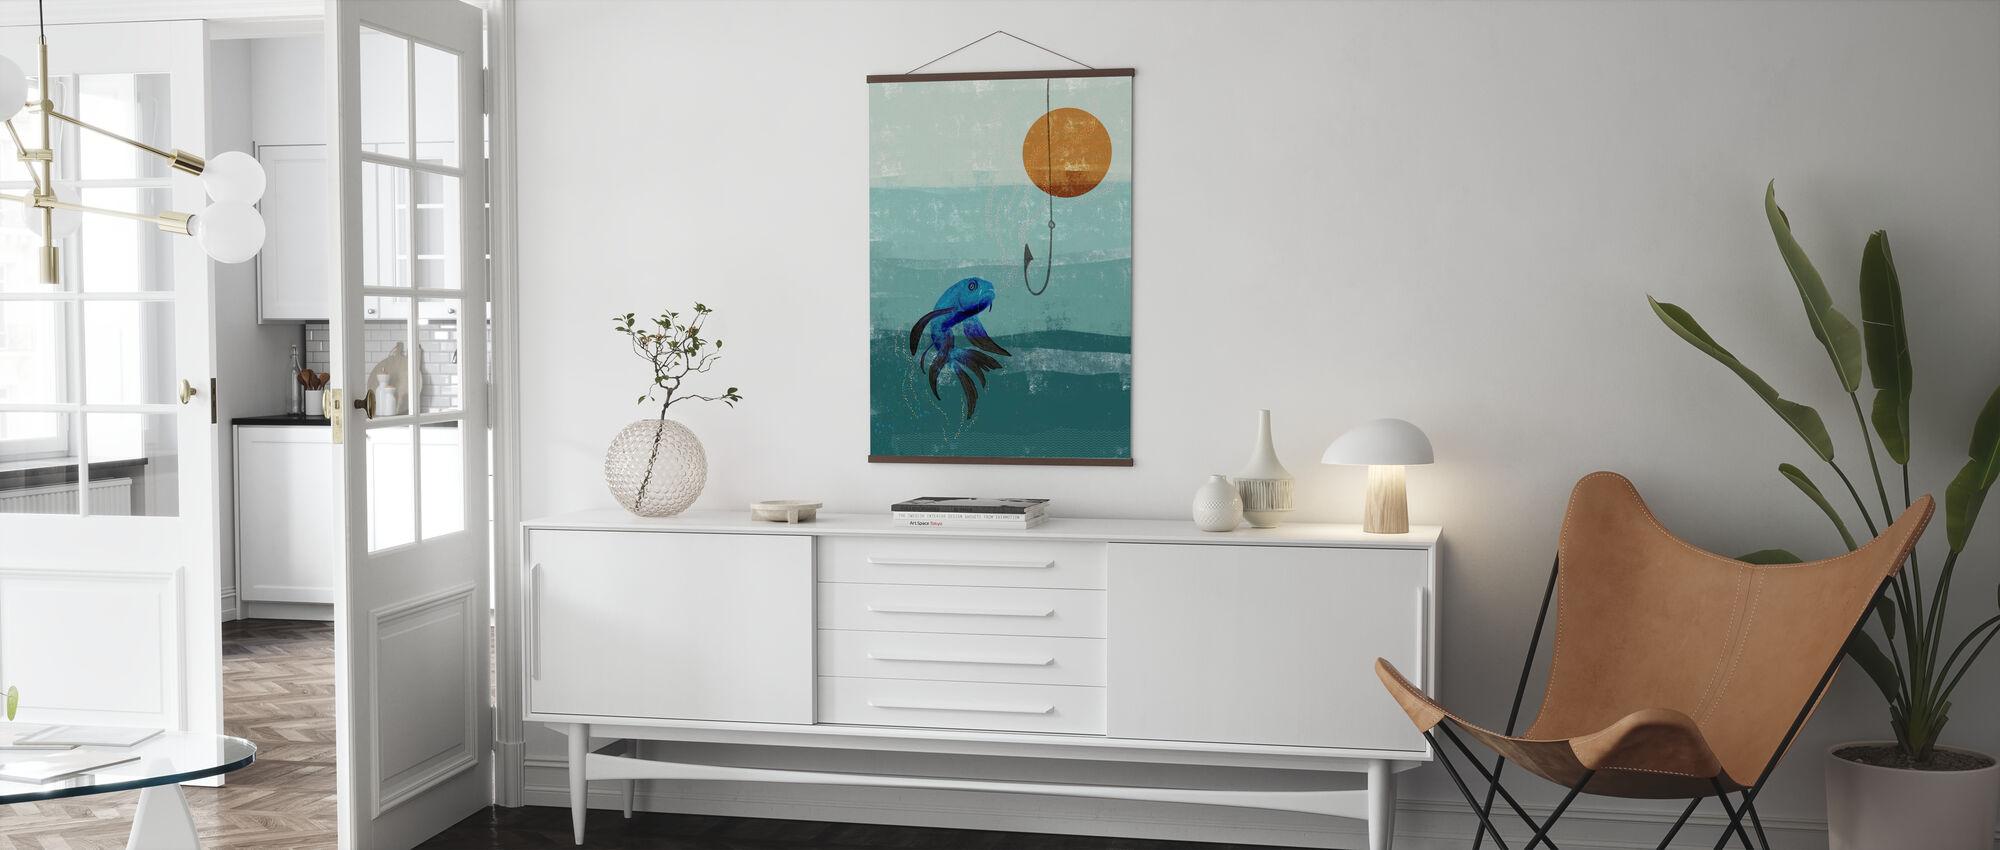 Fish Tank - Poster - Living Room